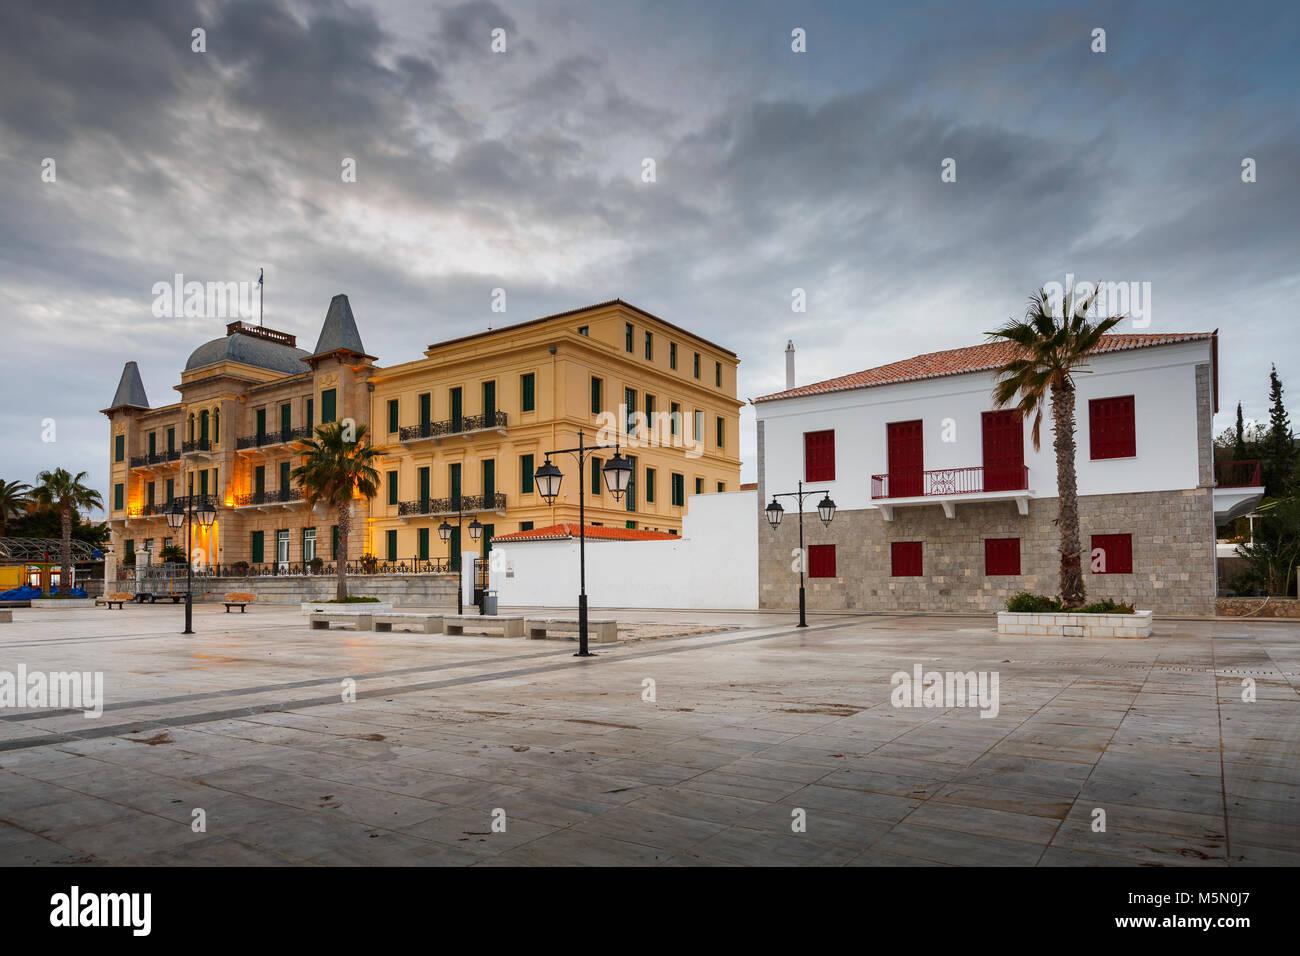 Poseidonion Grand Hotel on Spetses island, Greece. - Stock Image